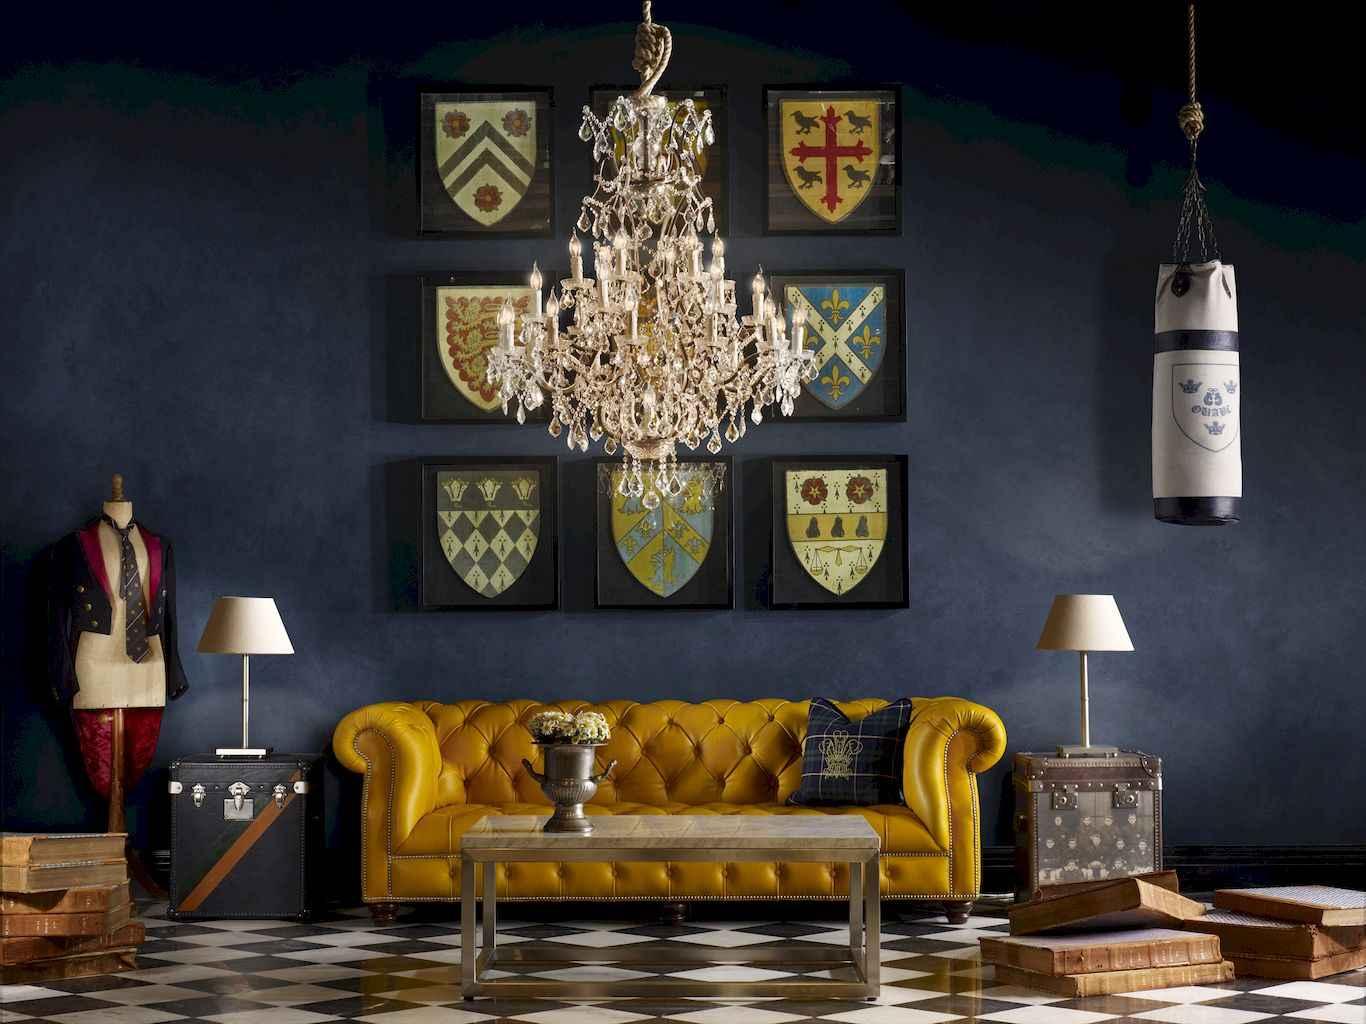 Simple clean vintage living room decorating ideas (4)